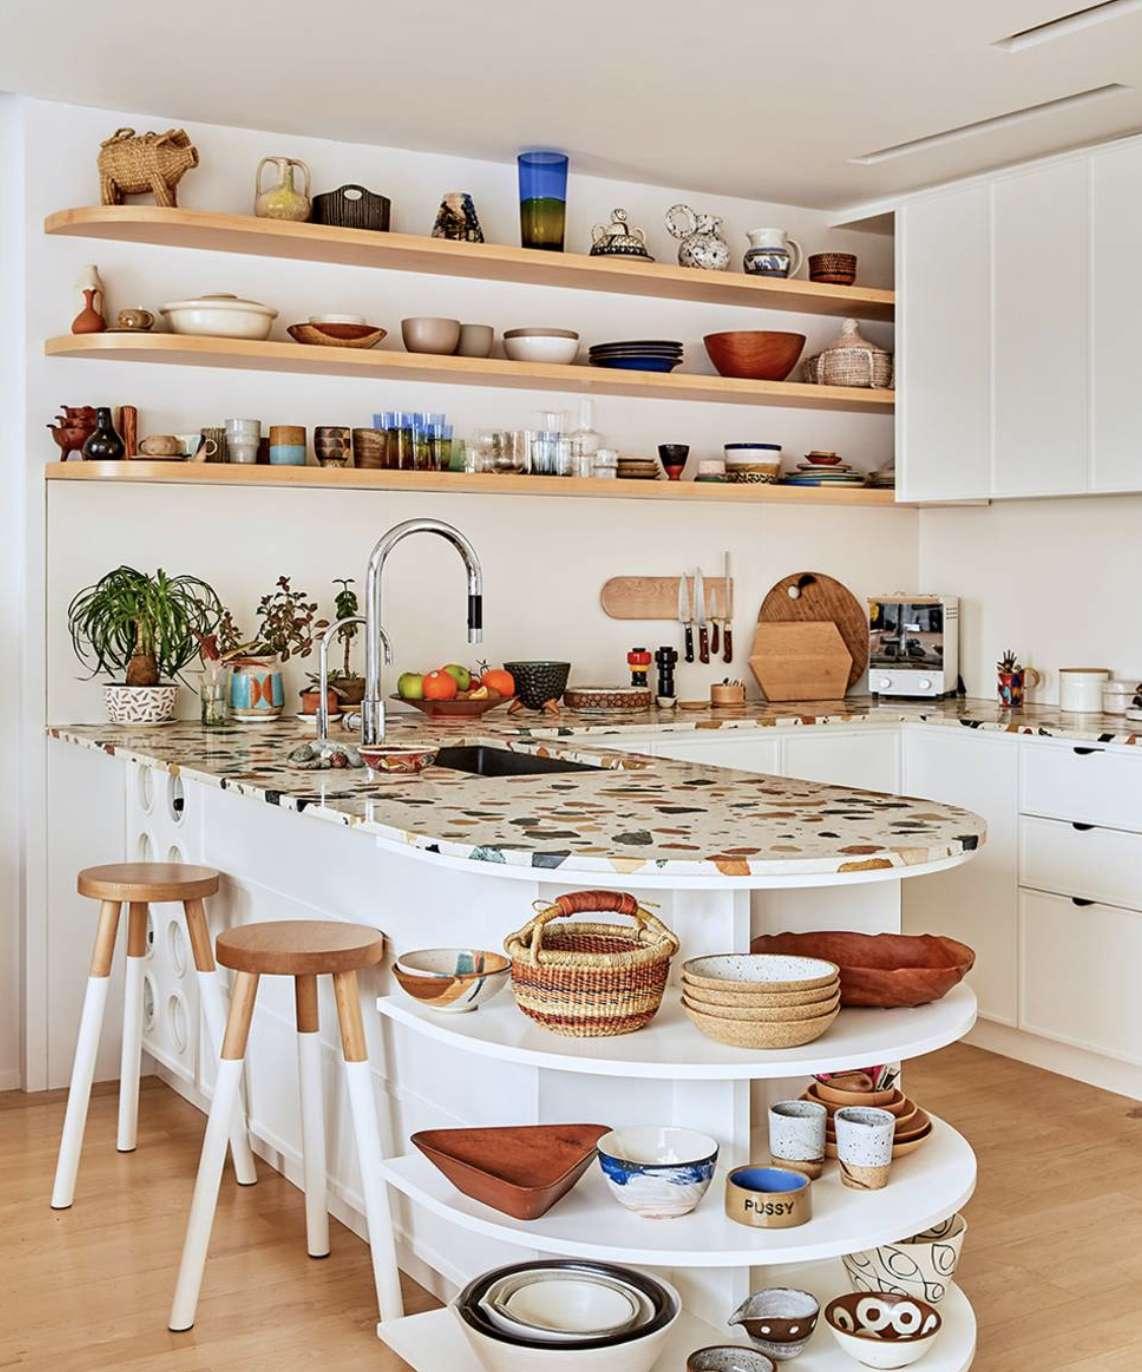 Kitchen with terrazzo